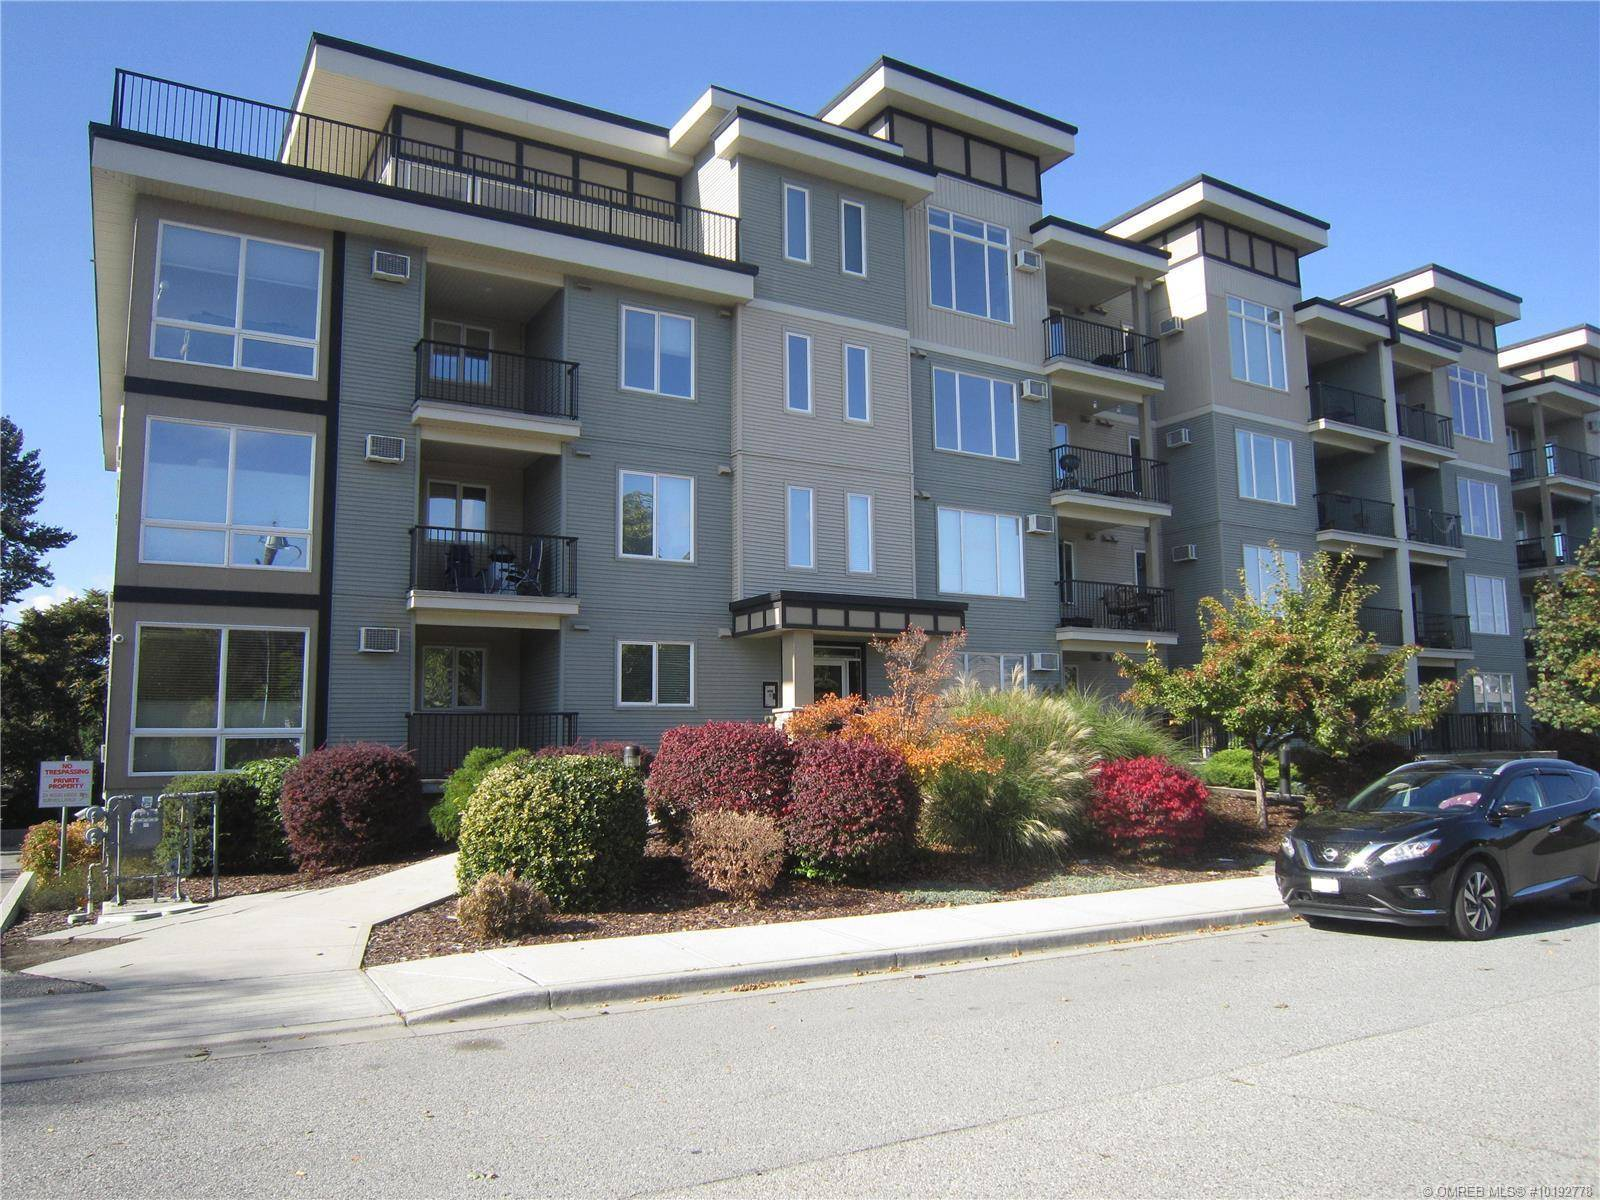 Condo for sale at 130 Barber Rd Unit 207 Kelowna British Columbia - MLS: 10192778